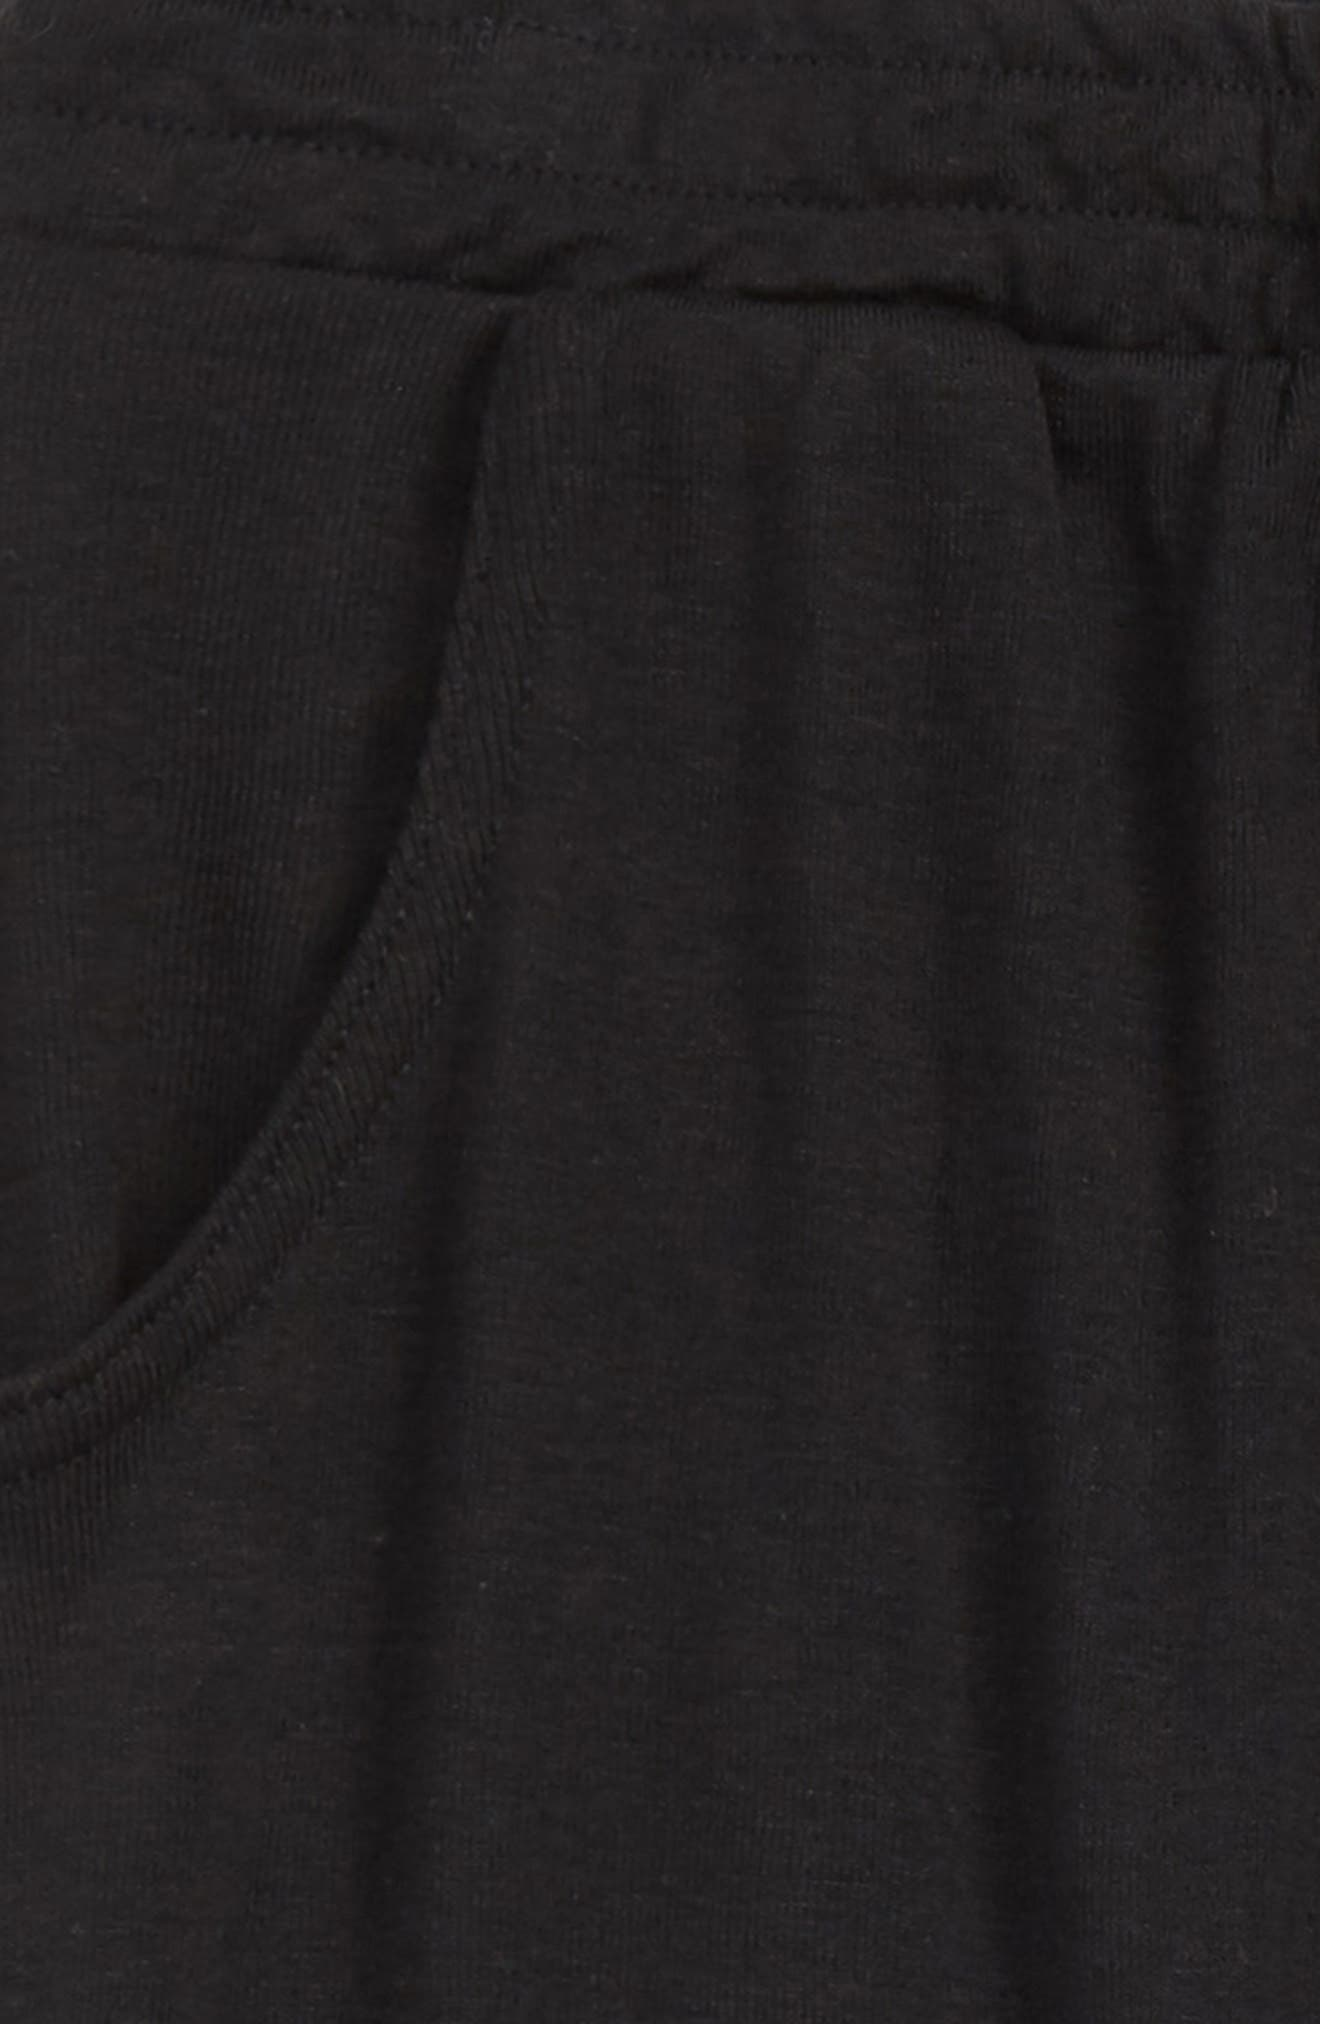 Stretch Cotton Jogger Pants,                             Alternate thumbnail 2, color,                             BLACK